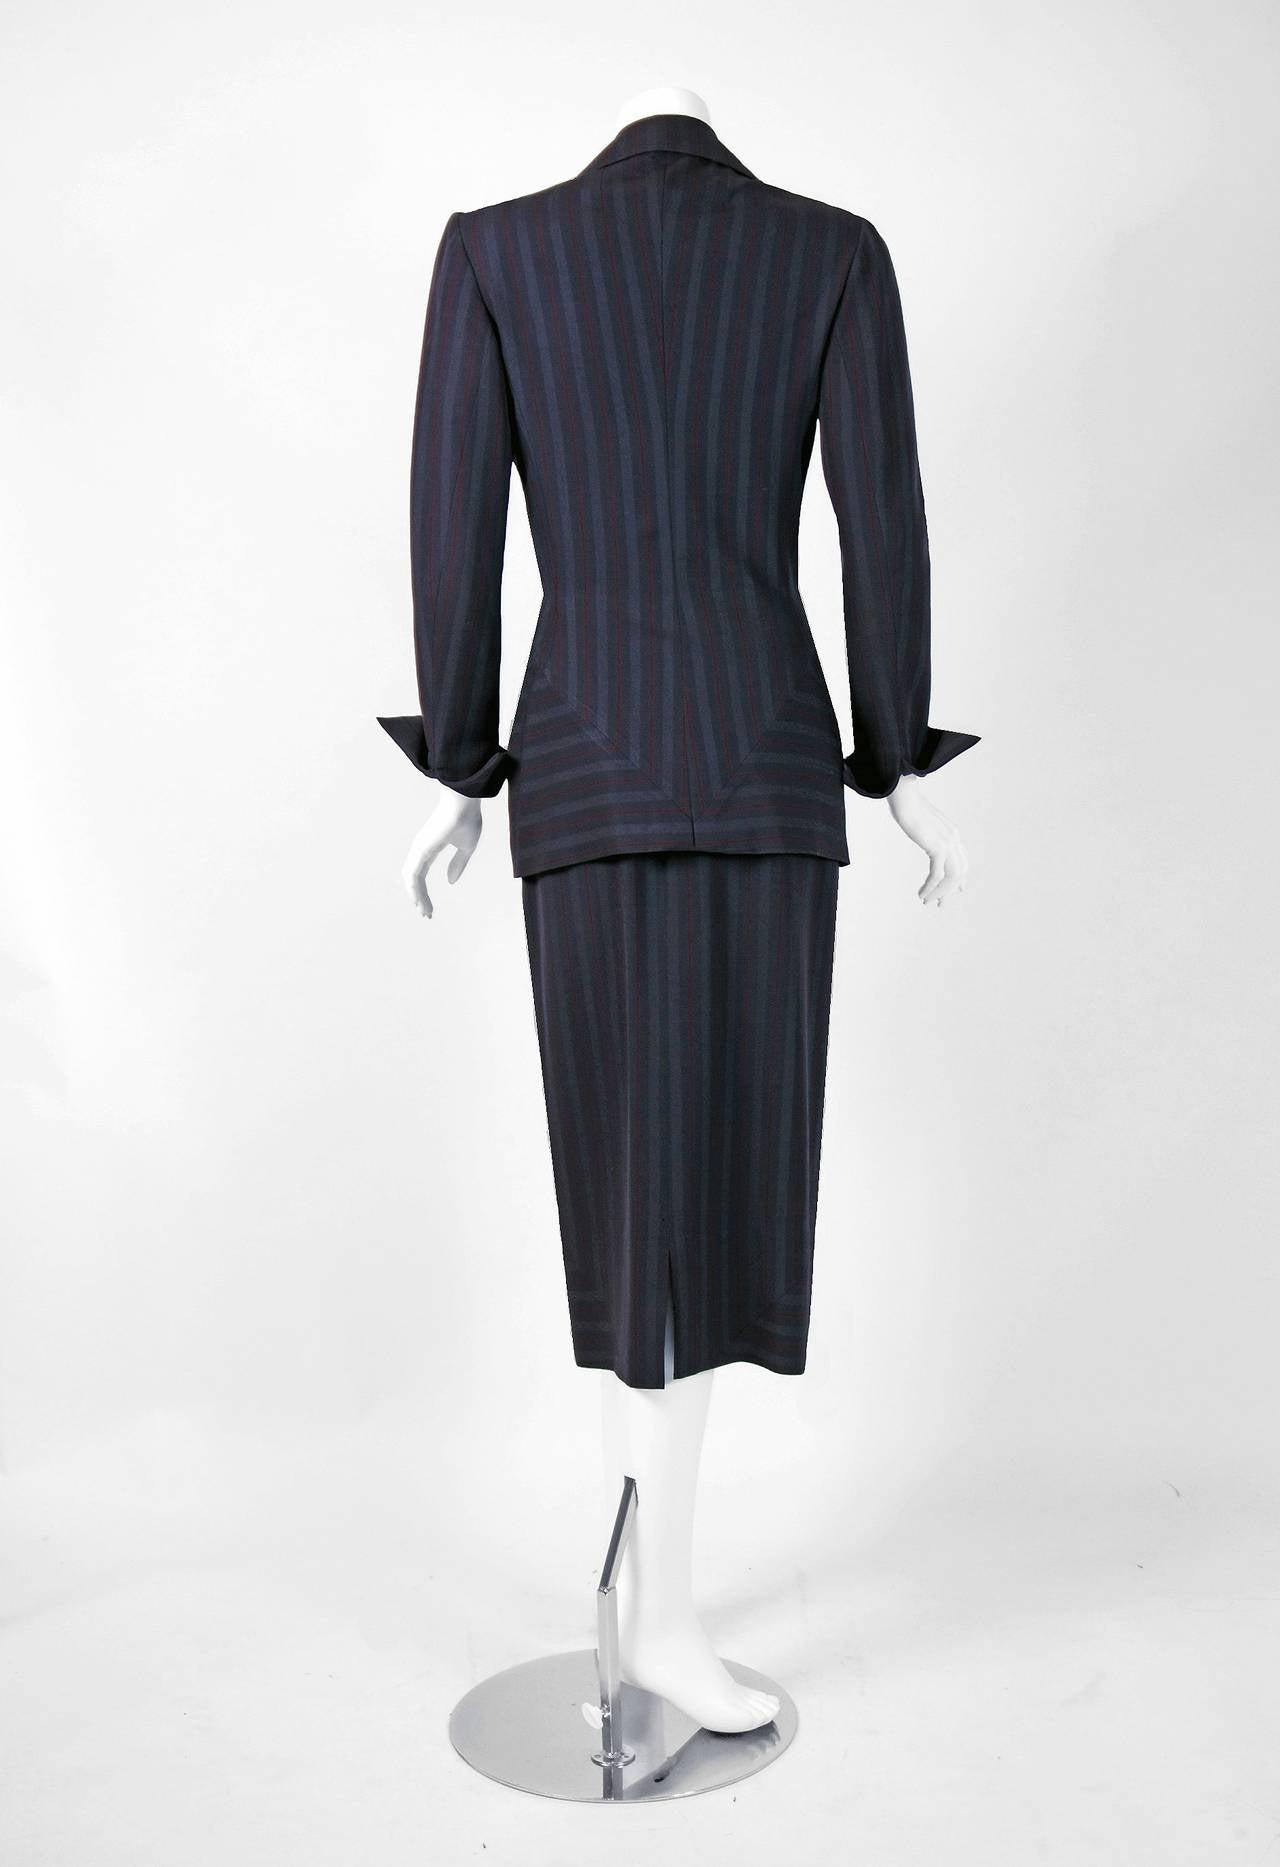 Women's 1940's Irene Grey Pinstripe Wool-Gabardine Deco Hourglass Jacket & Skirt Suit For Sale